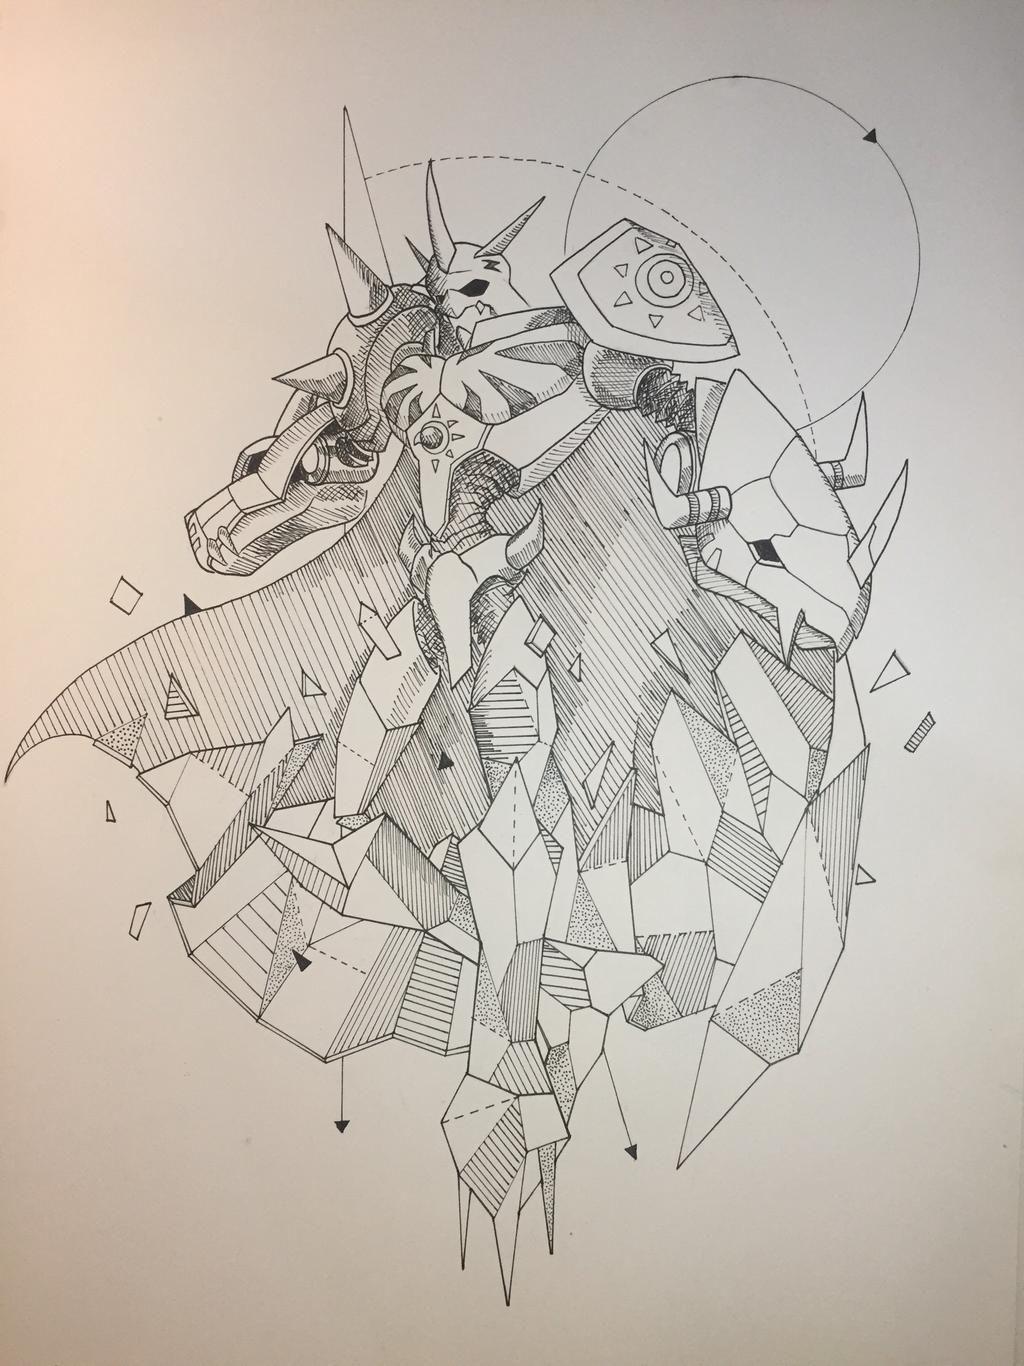 Geometric Omegamon By Wabbuh On Deviantart In 2020 Digimon Tattoo Digimon Tamers Digimon